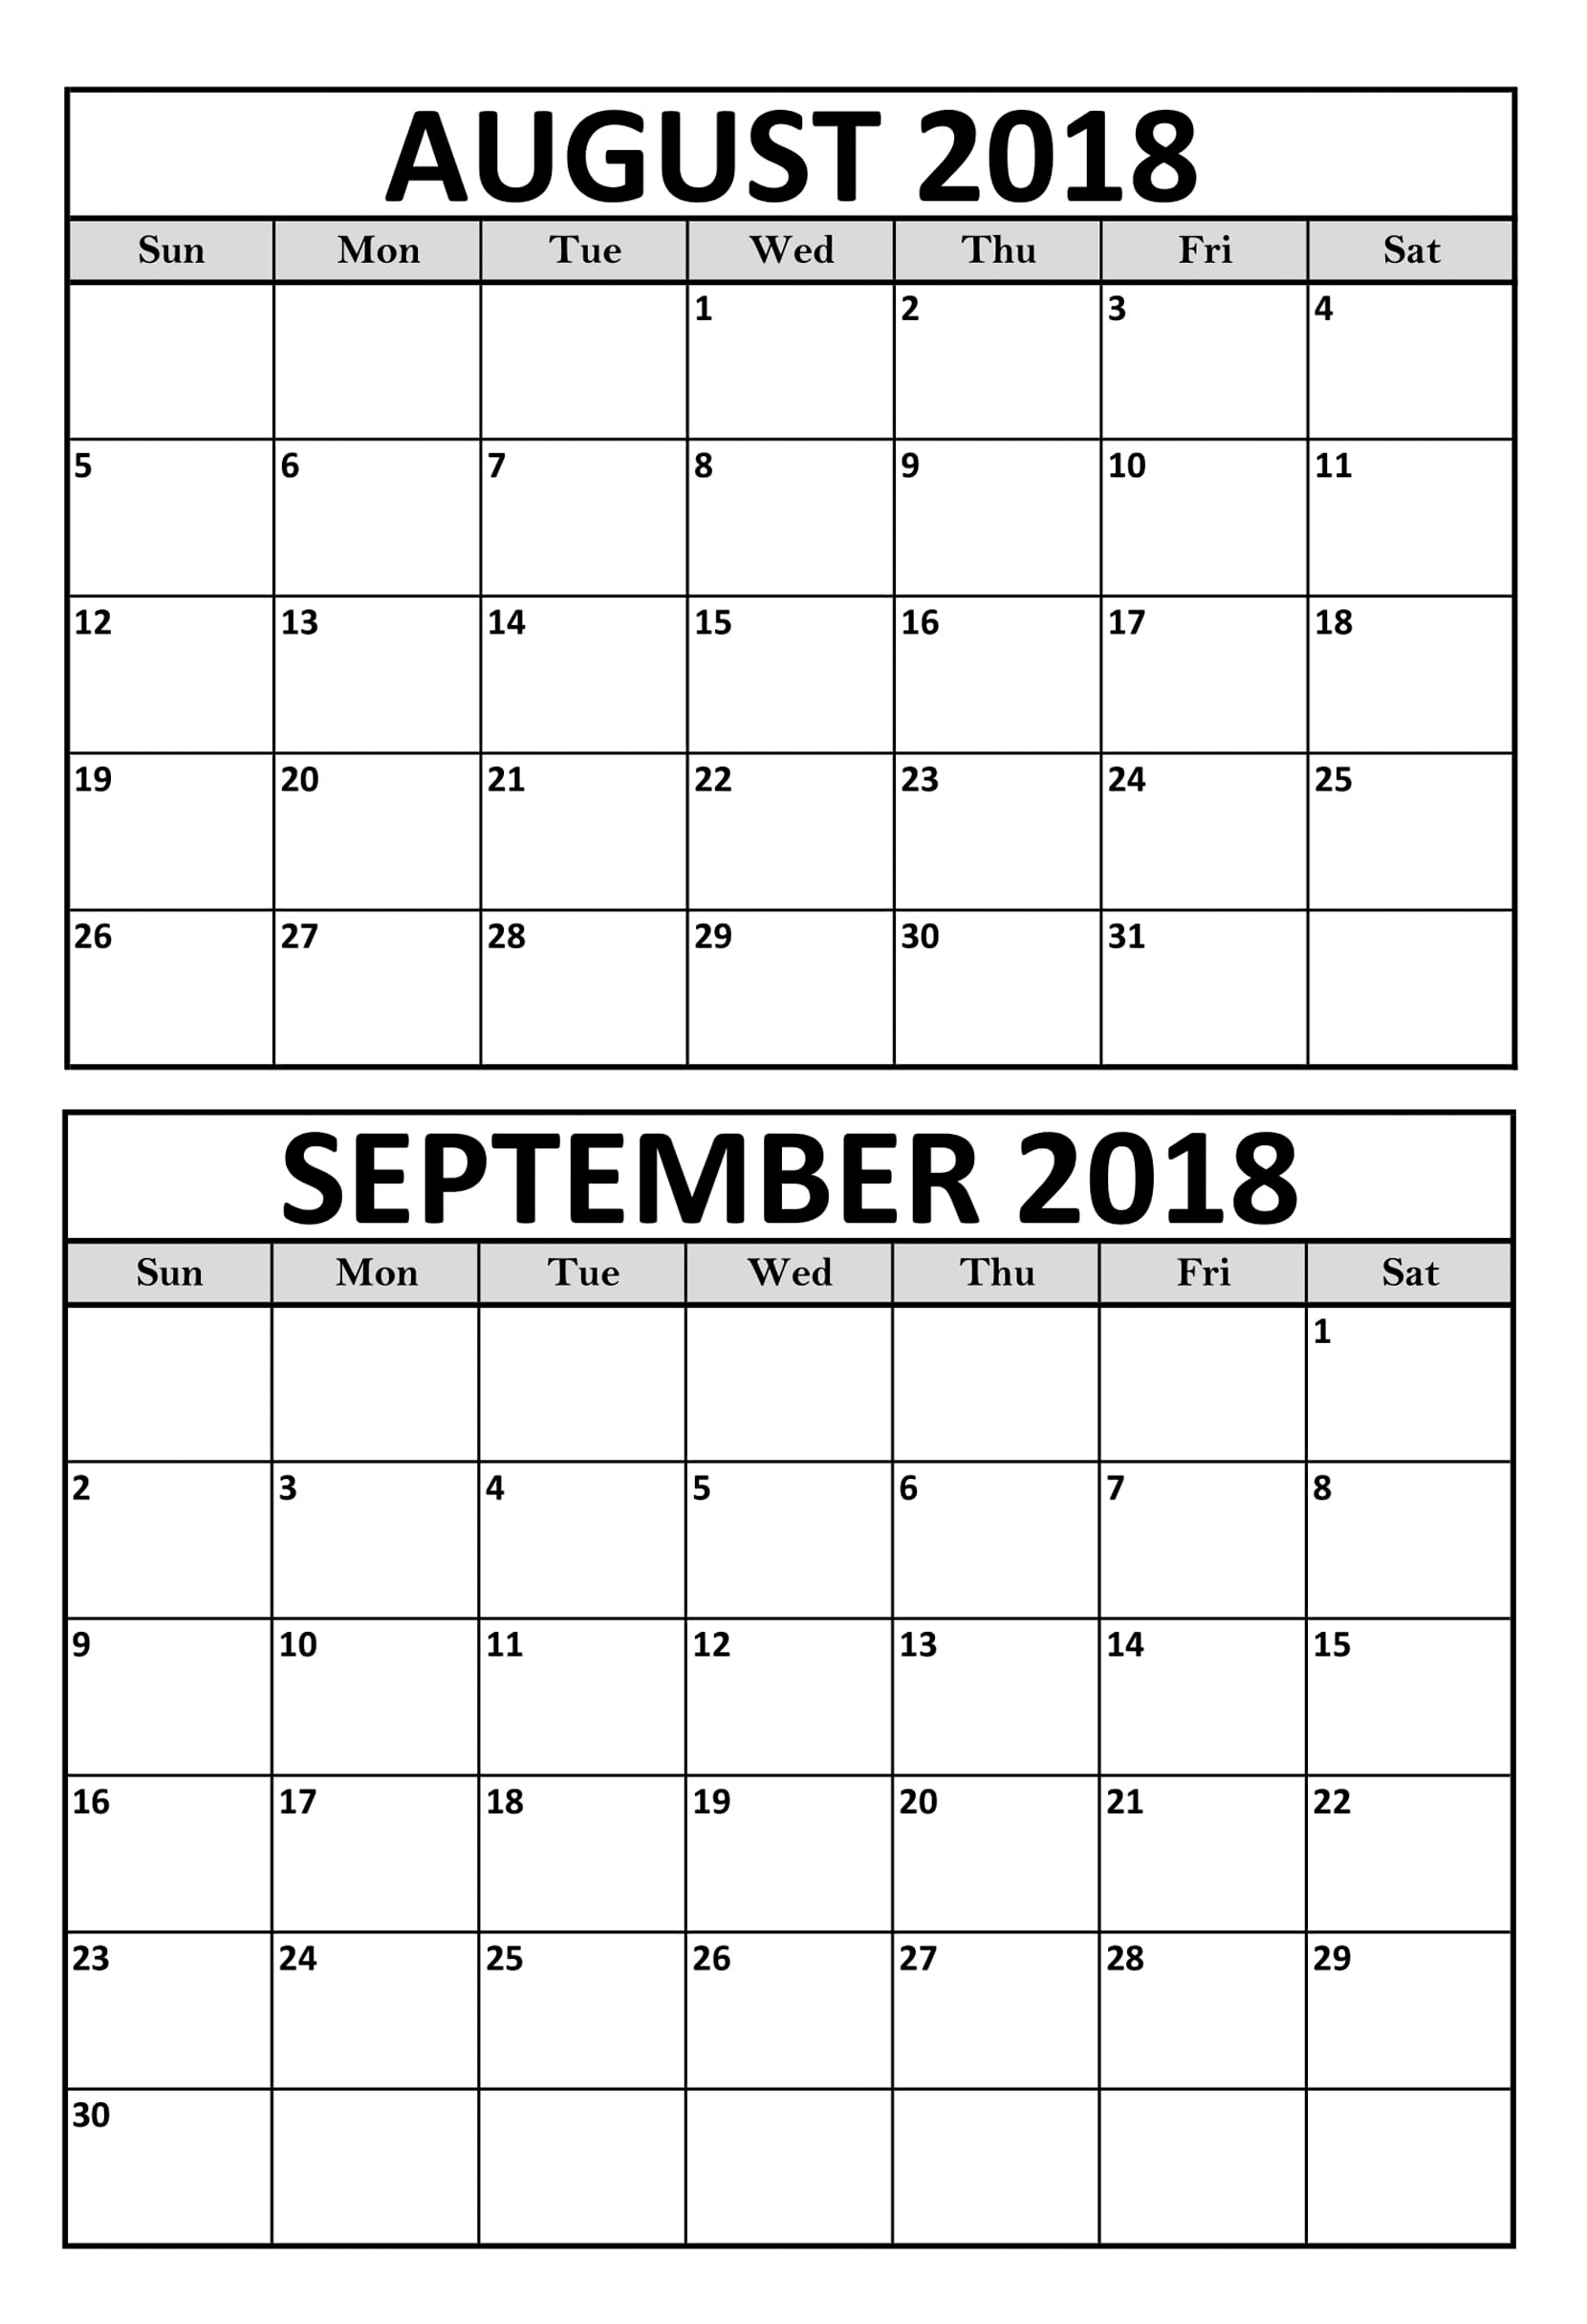 August September 2018 Calendar Printable Template | August September for August And September Calendar Printable